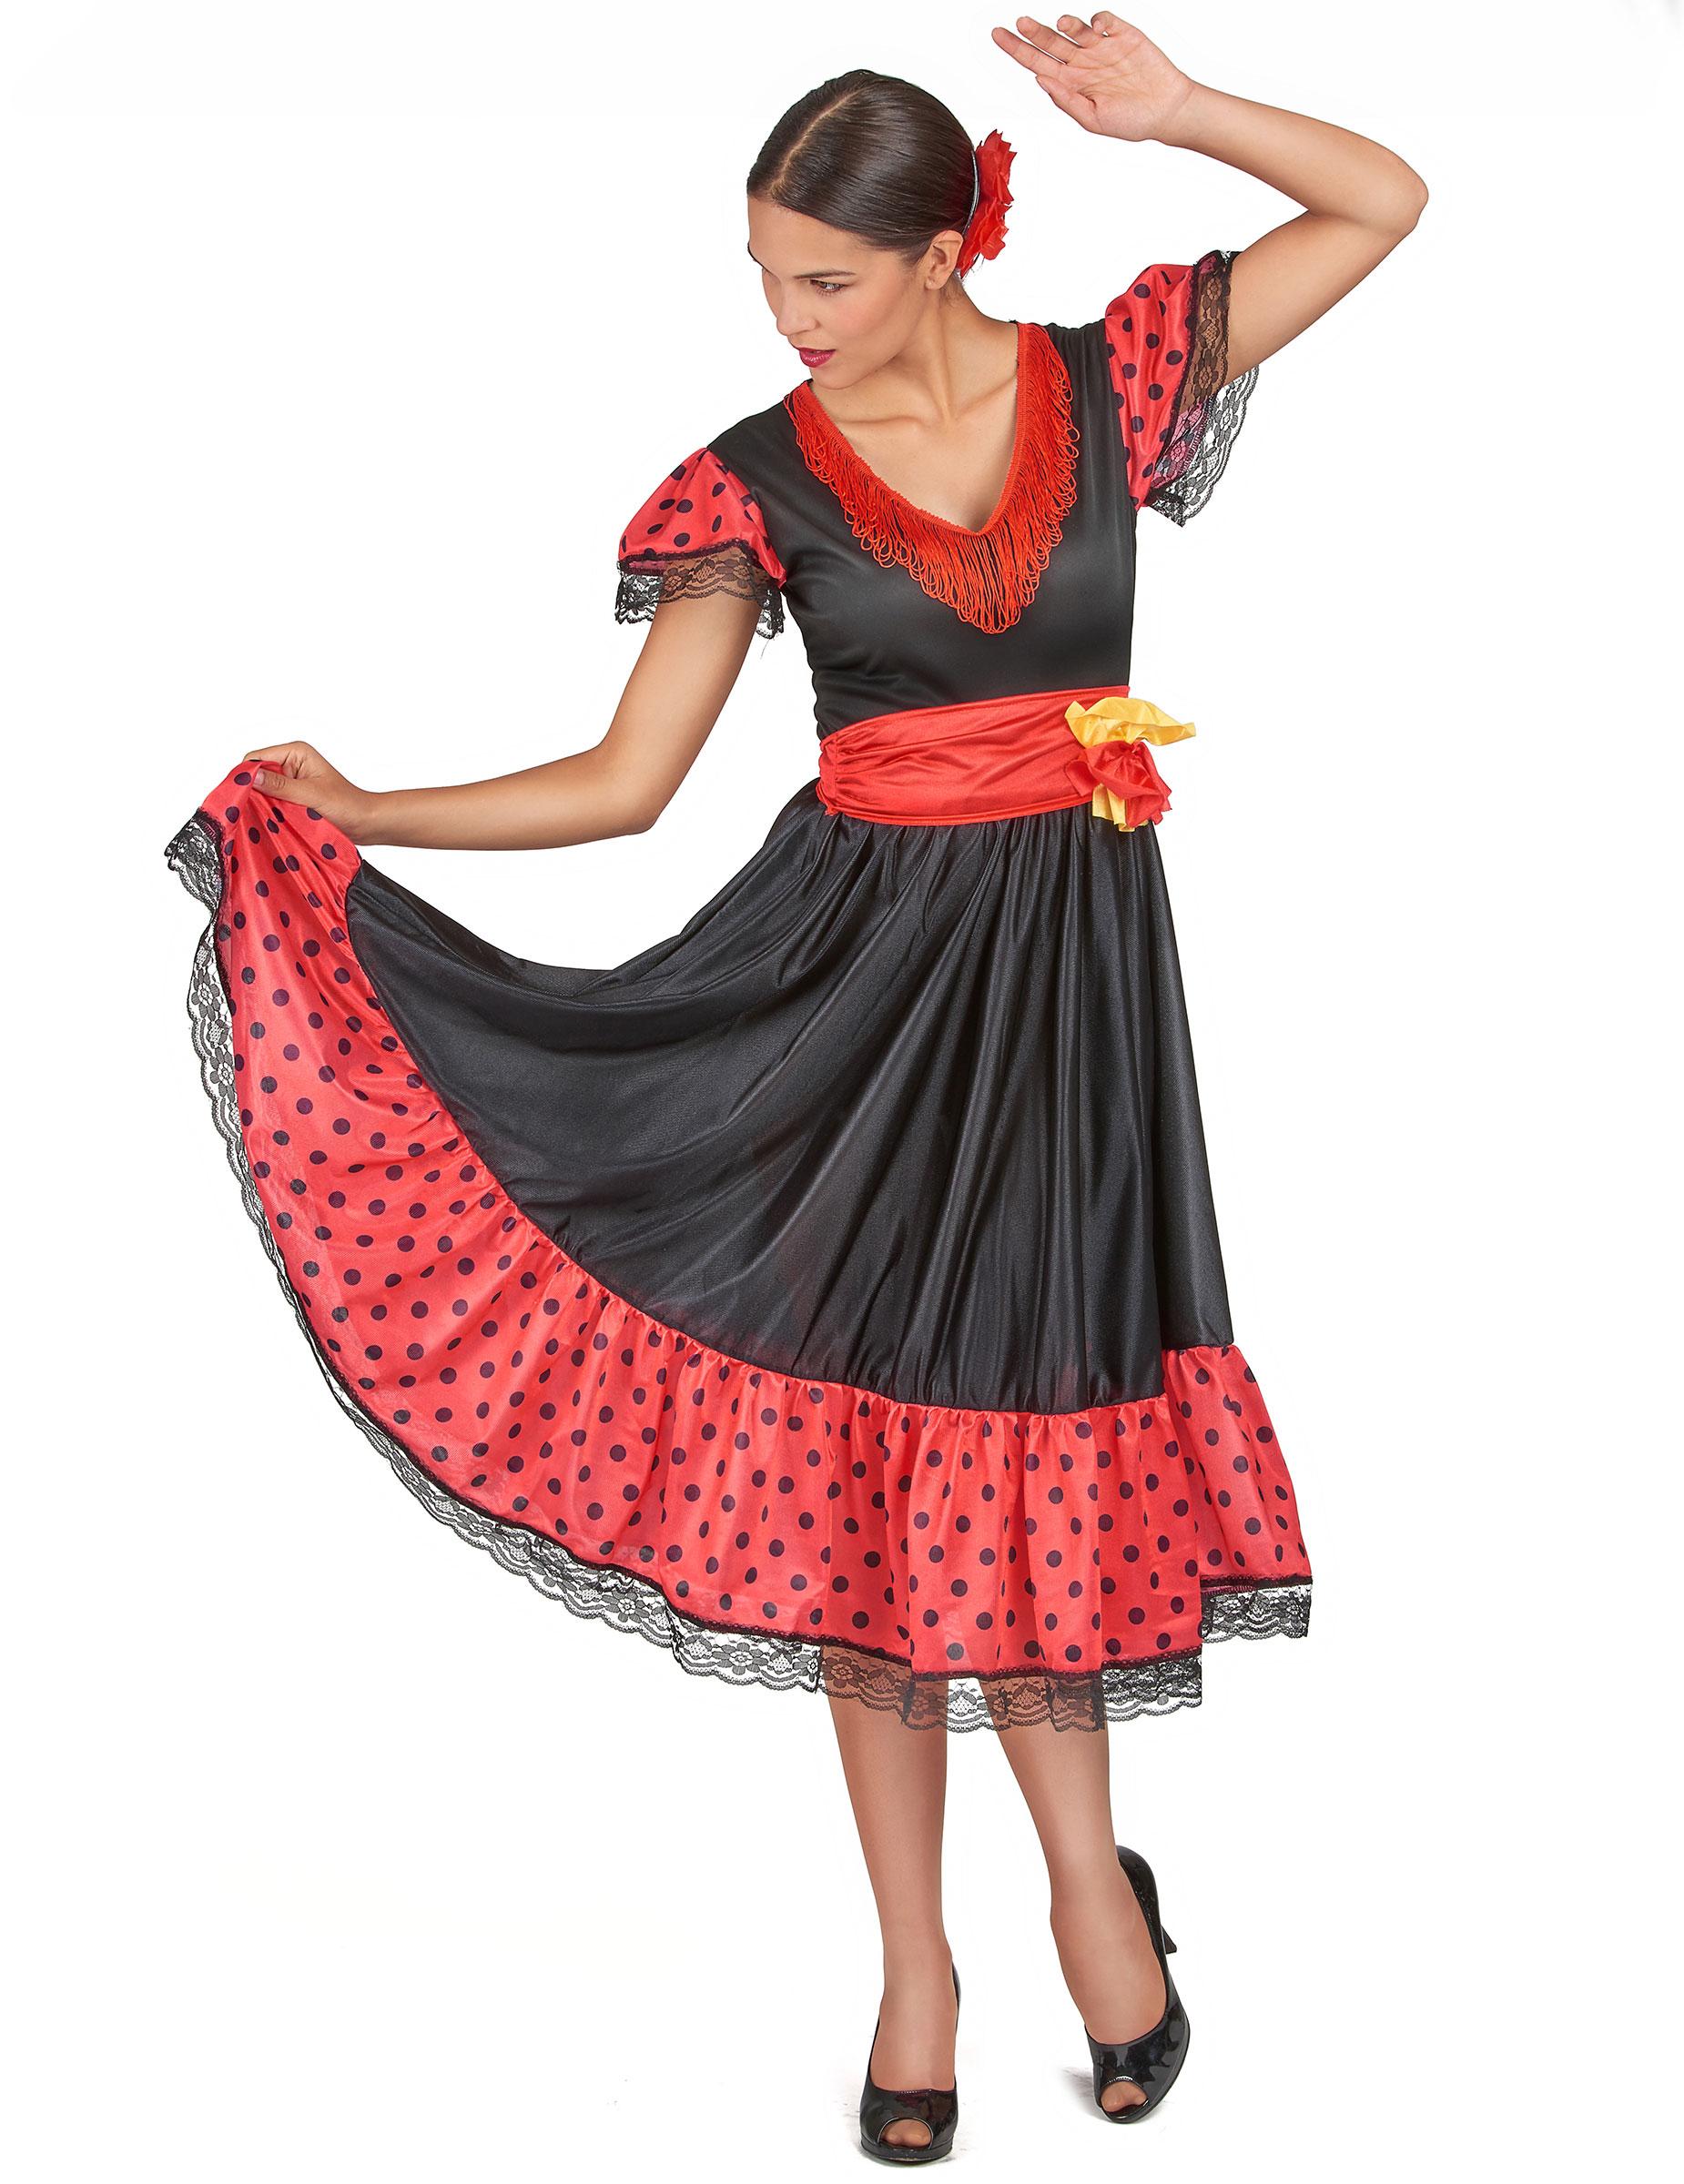 Cher Costume Espagnole Costume Pas Cher Espagnole Pas Costume Espagnole Femme Femme Femme uFKJc1T3l